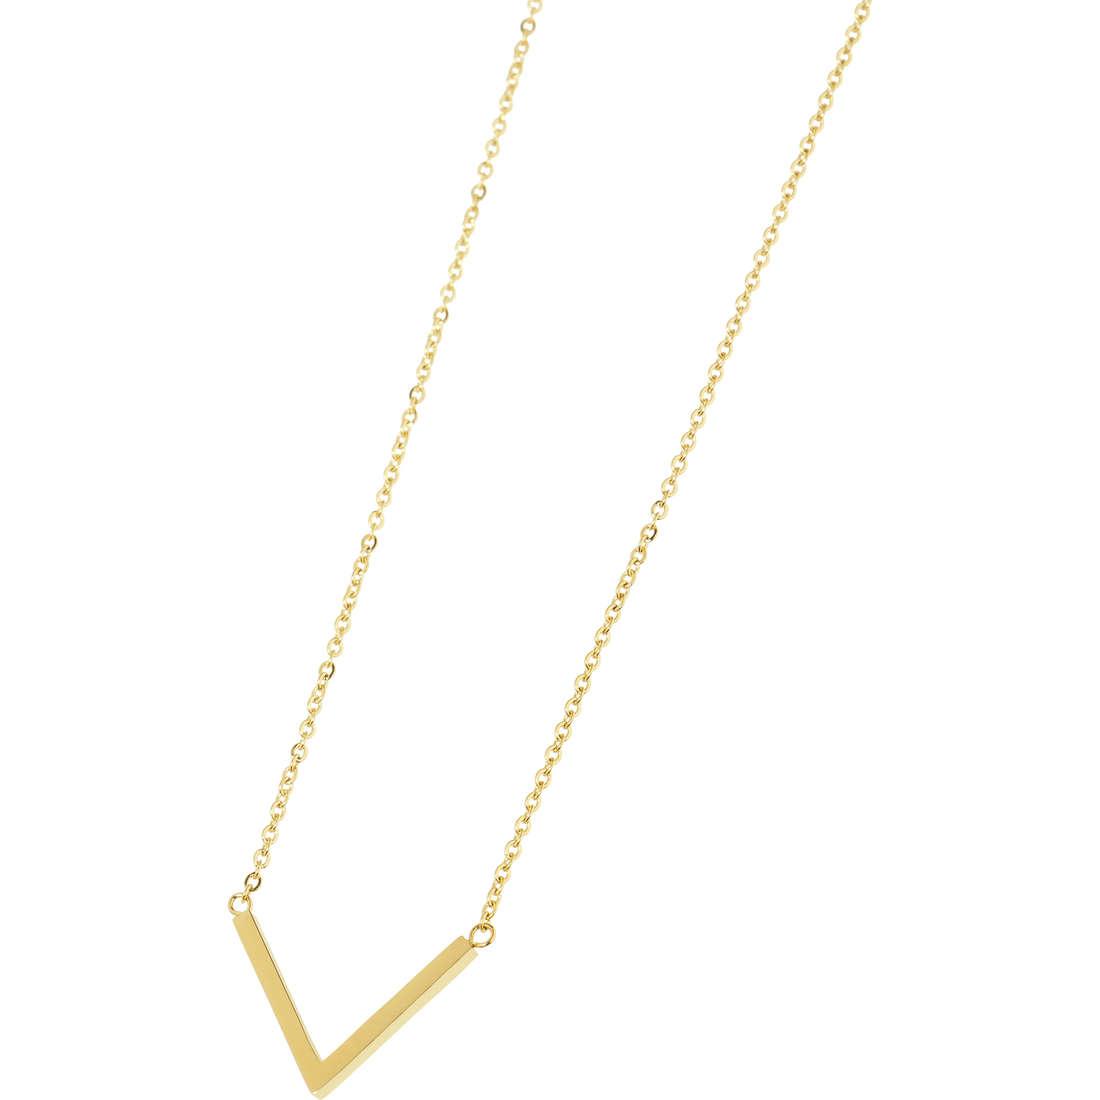 necklace woman jewellery Marlù Woman Chic 2CN0042G